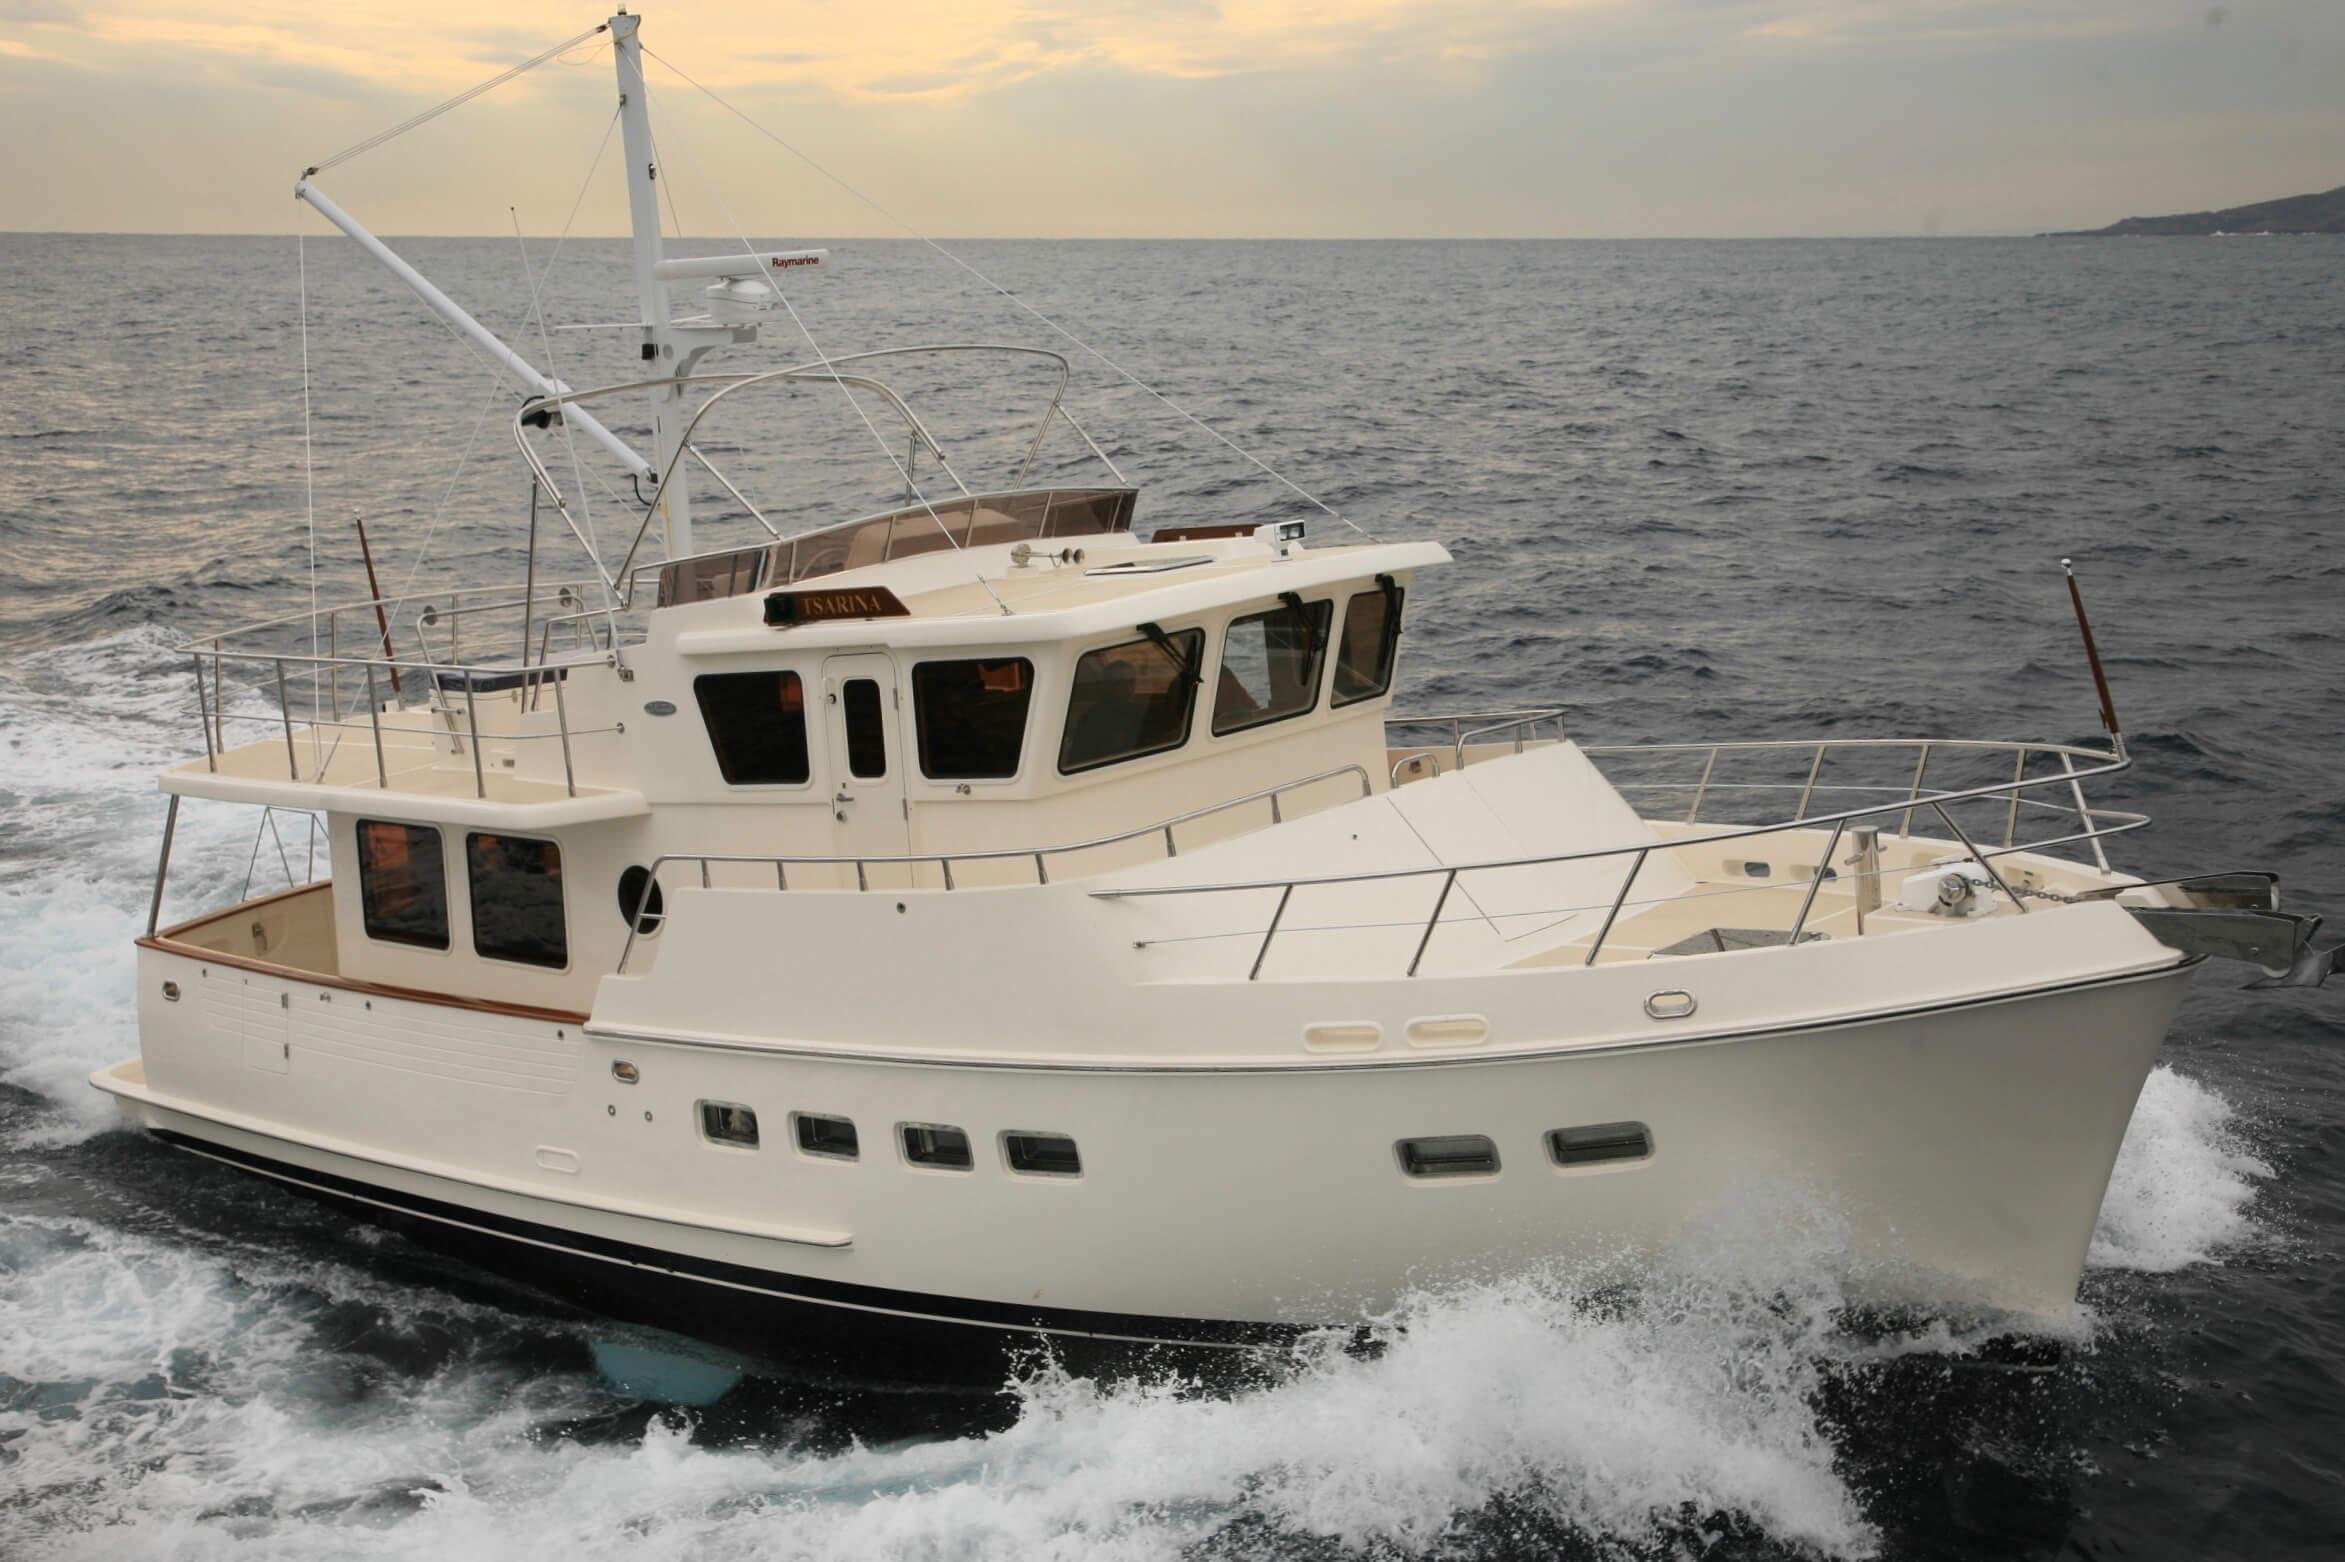 Selene 45 Pilothouse Trawlers - The serious passage-maker